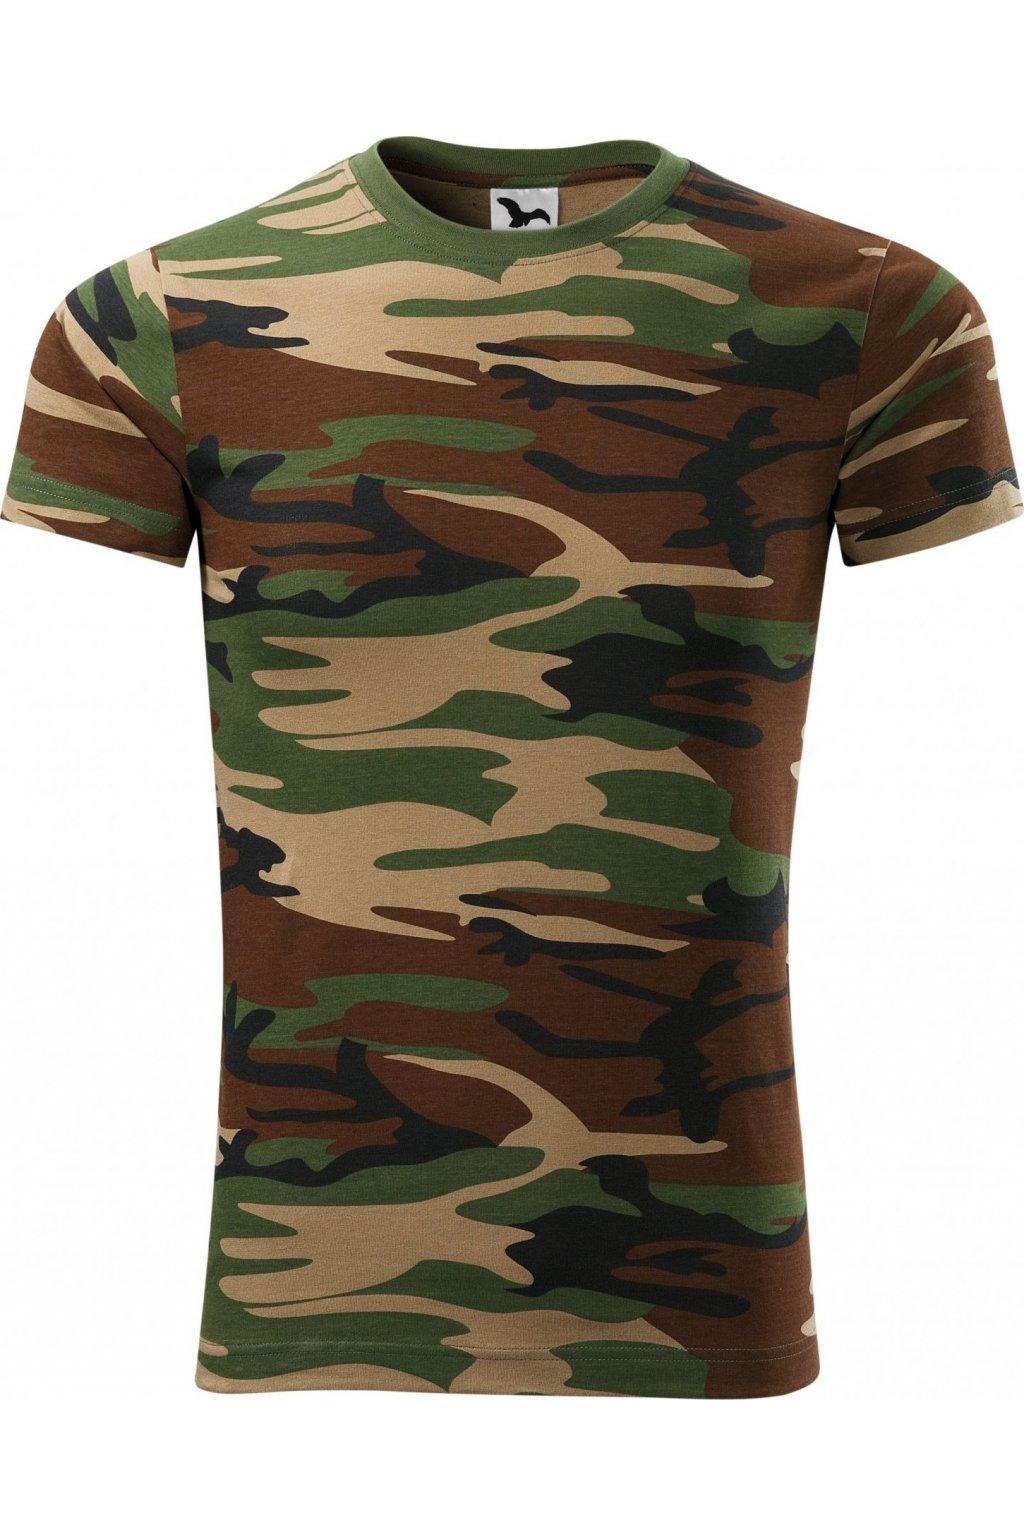 Camouflage 144 Tričko unisex, Adler Malfini